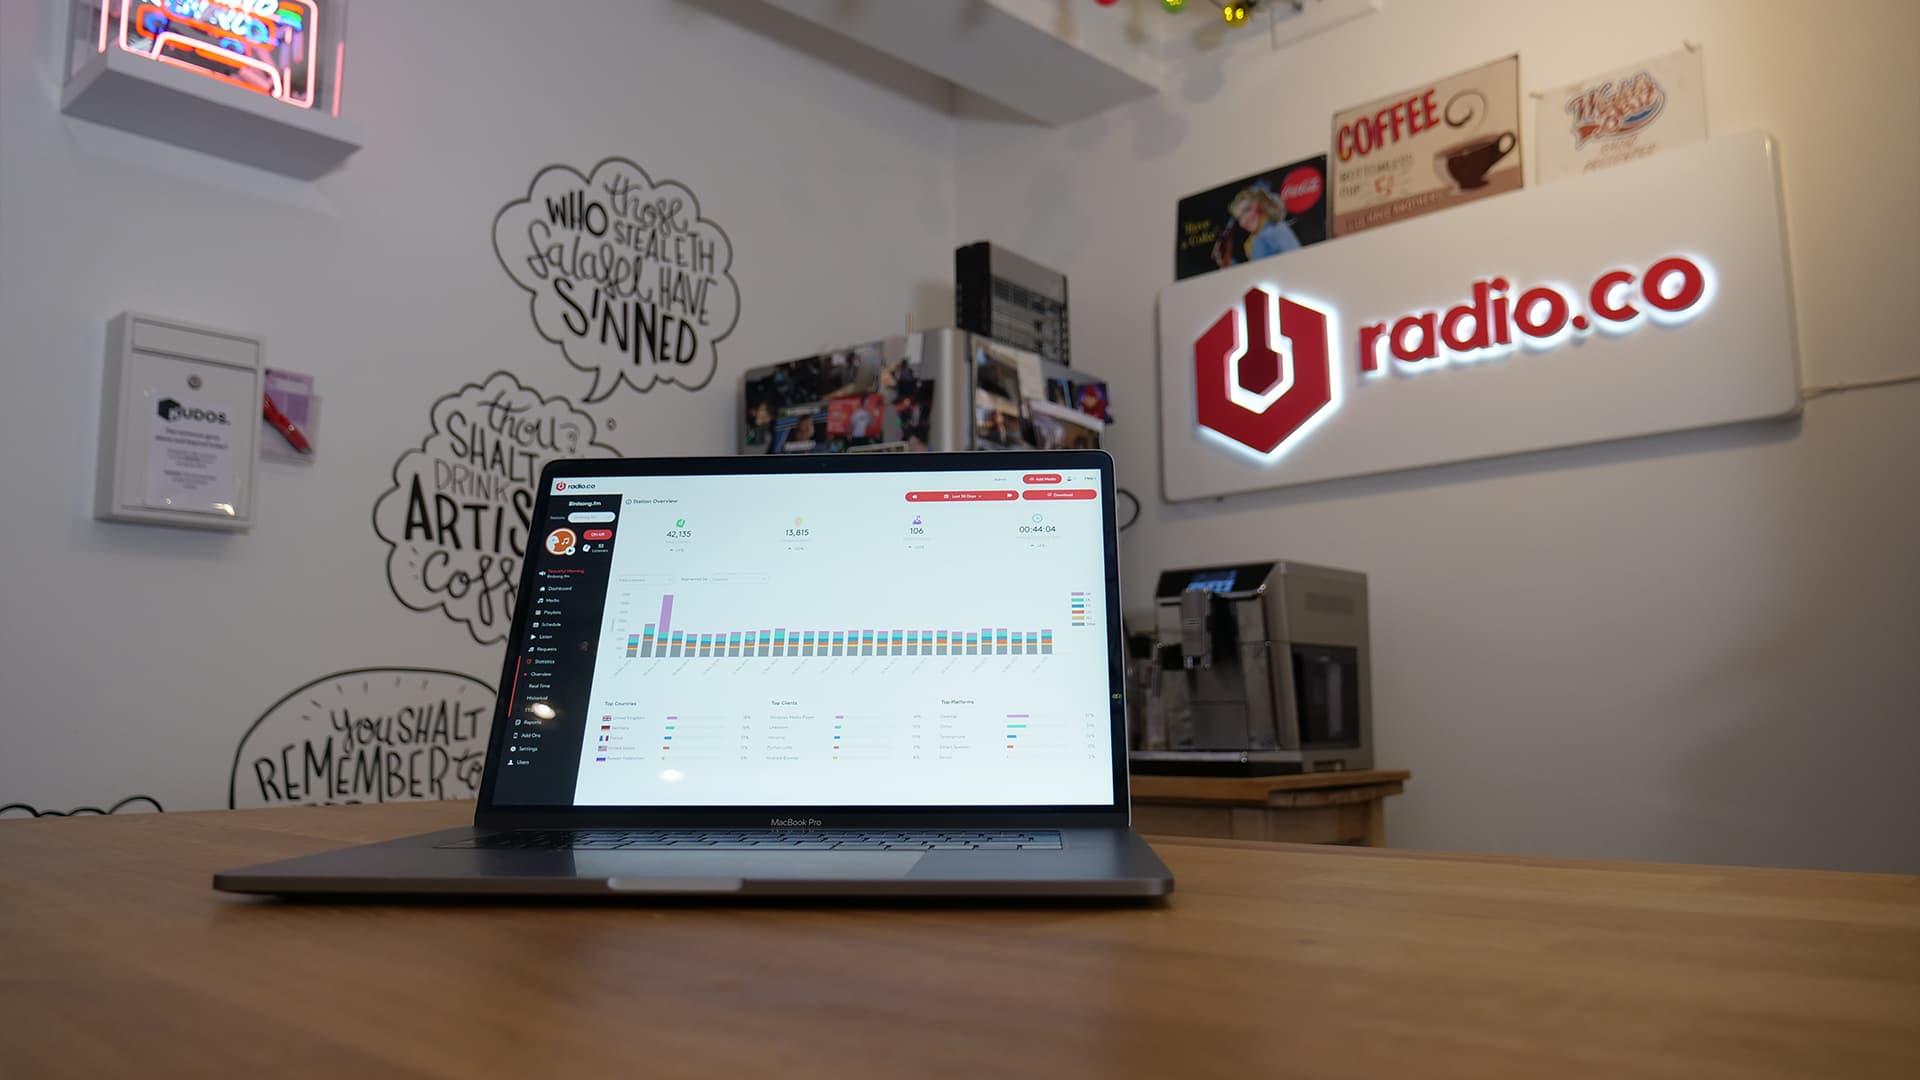 Start an Internet Radio Station: Radio.co on laptop